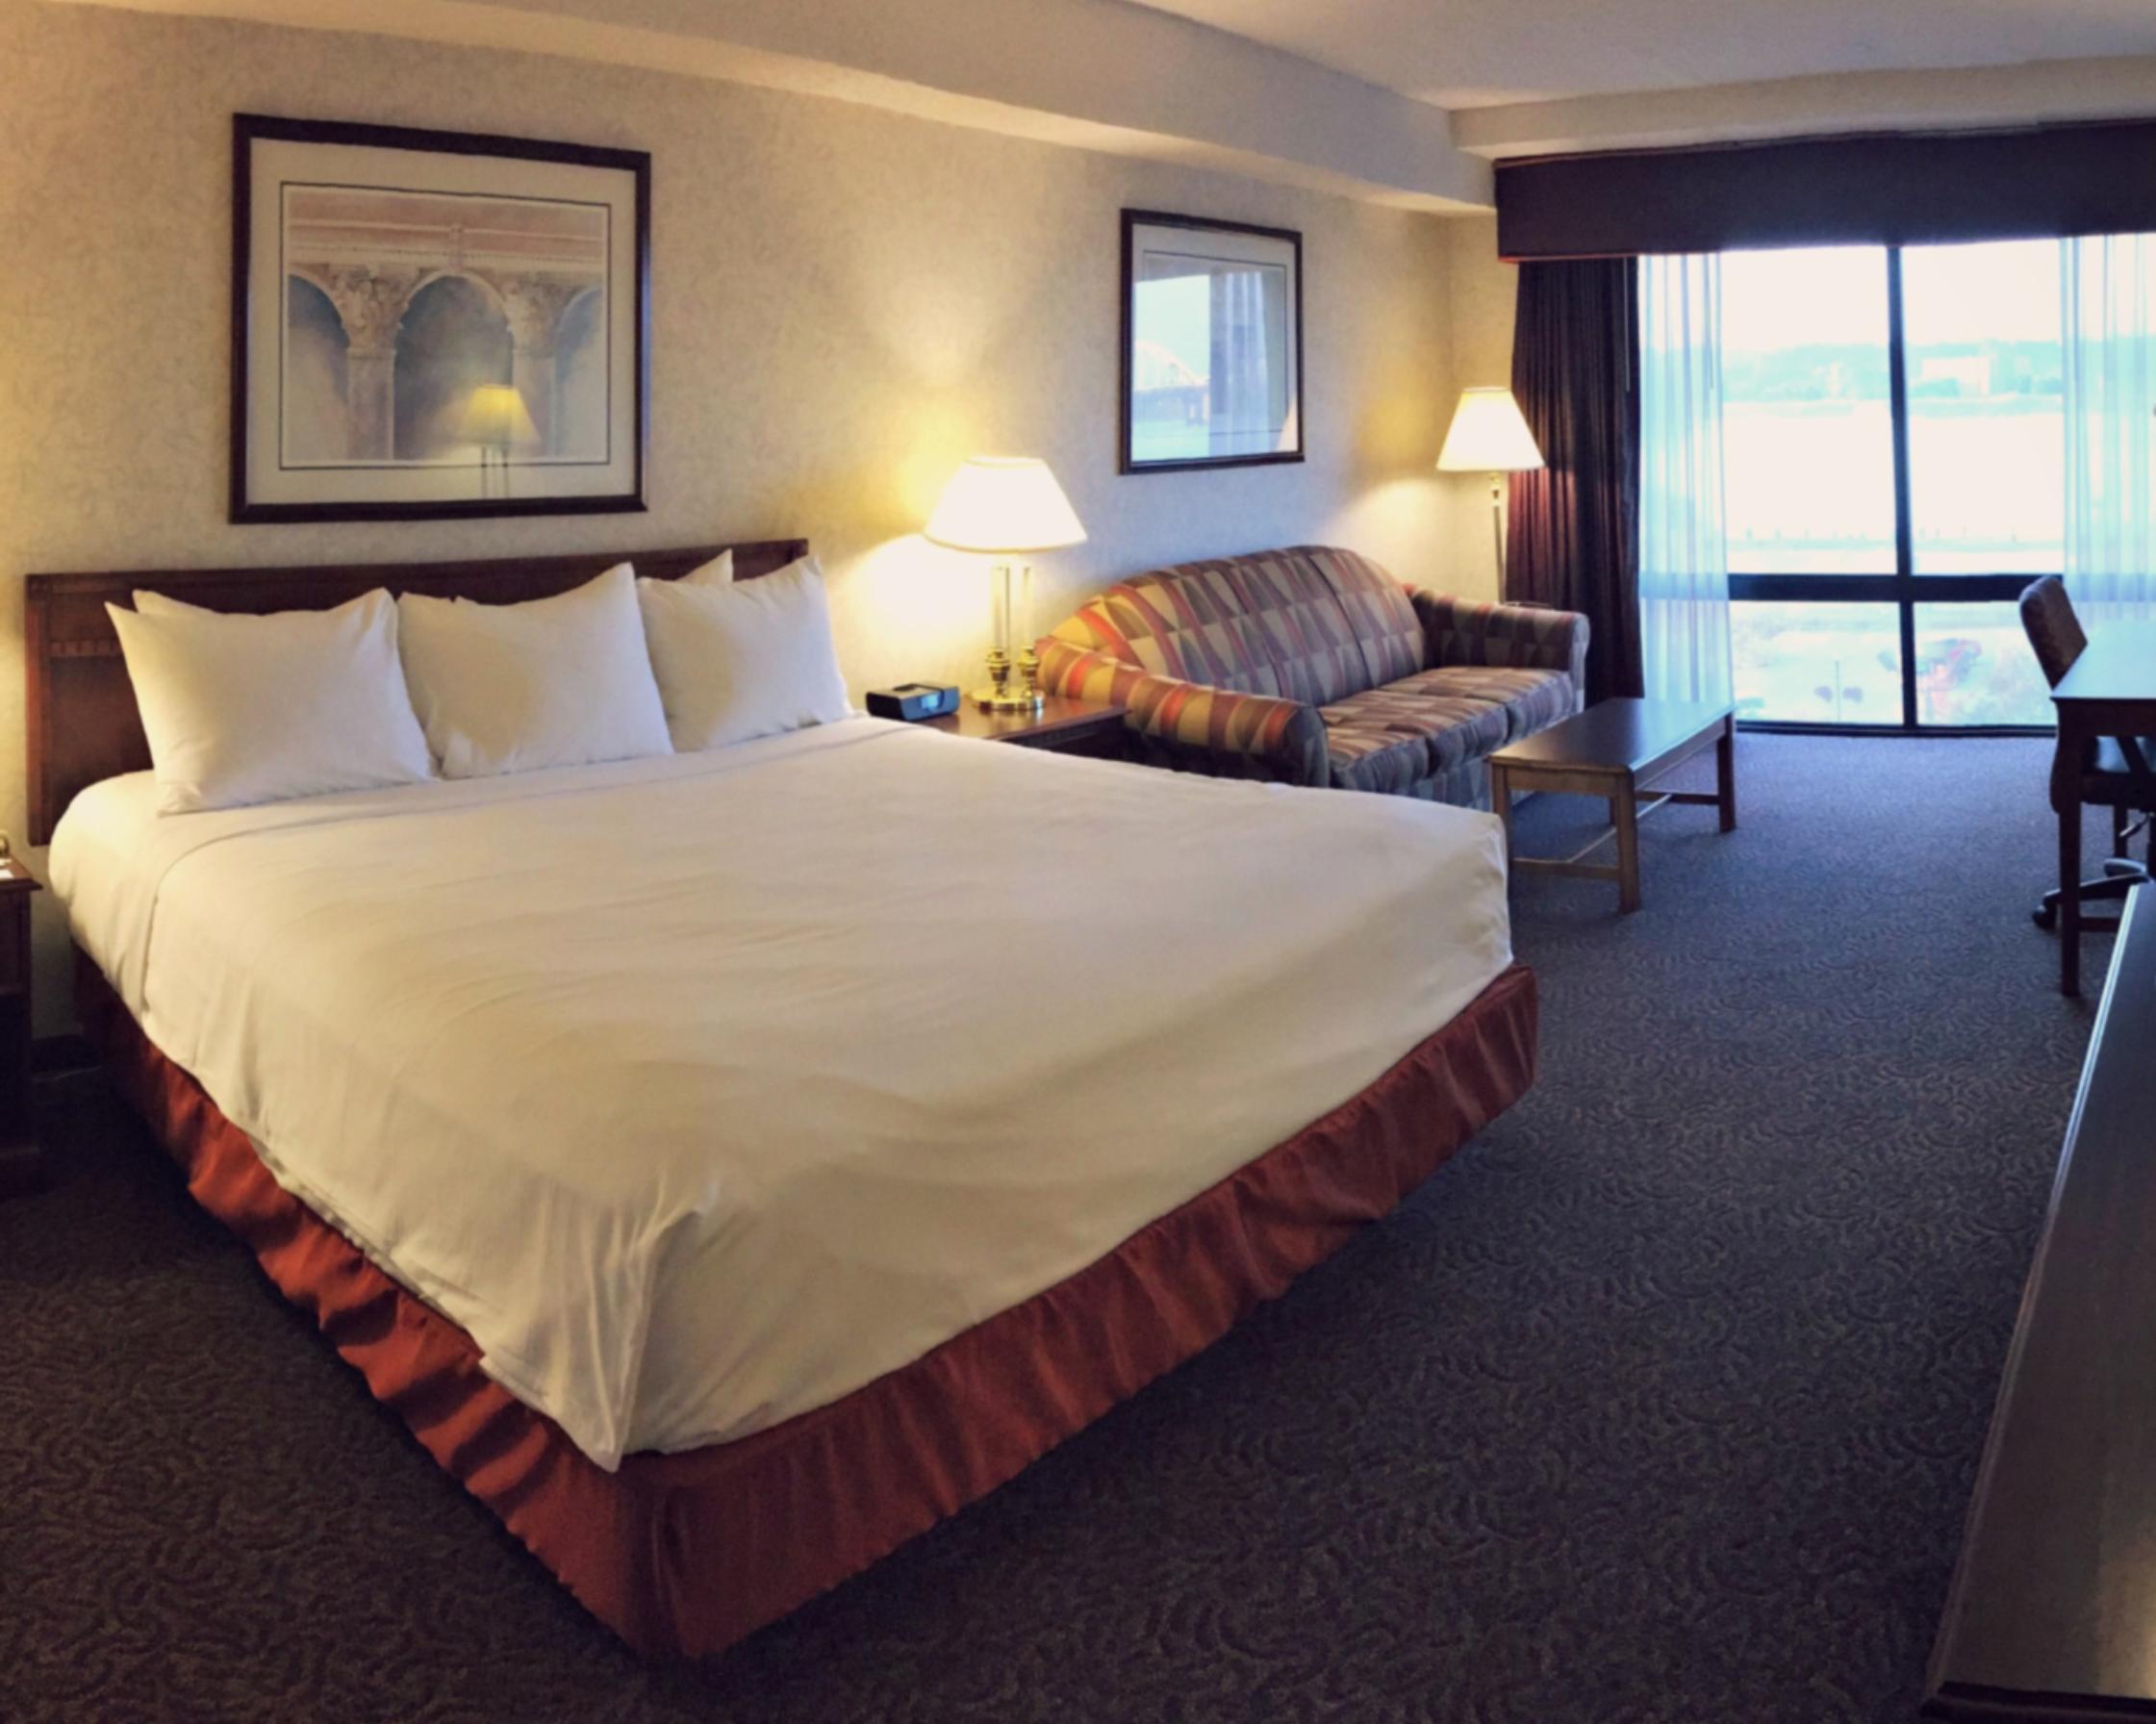 https://www.hotelsbyday.com/_data/default-hotel_image/3/15542/dvpt-87310772-king-bed-2241x1792.png